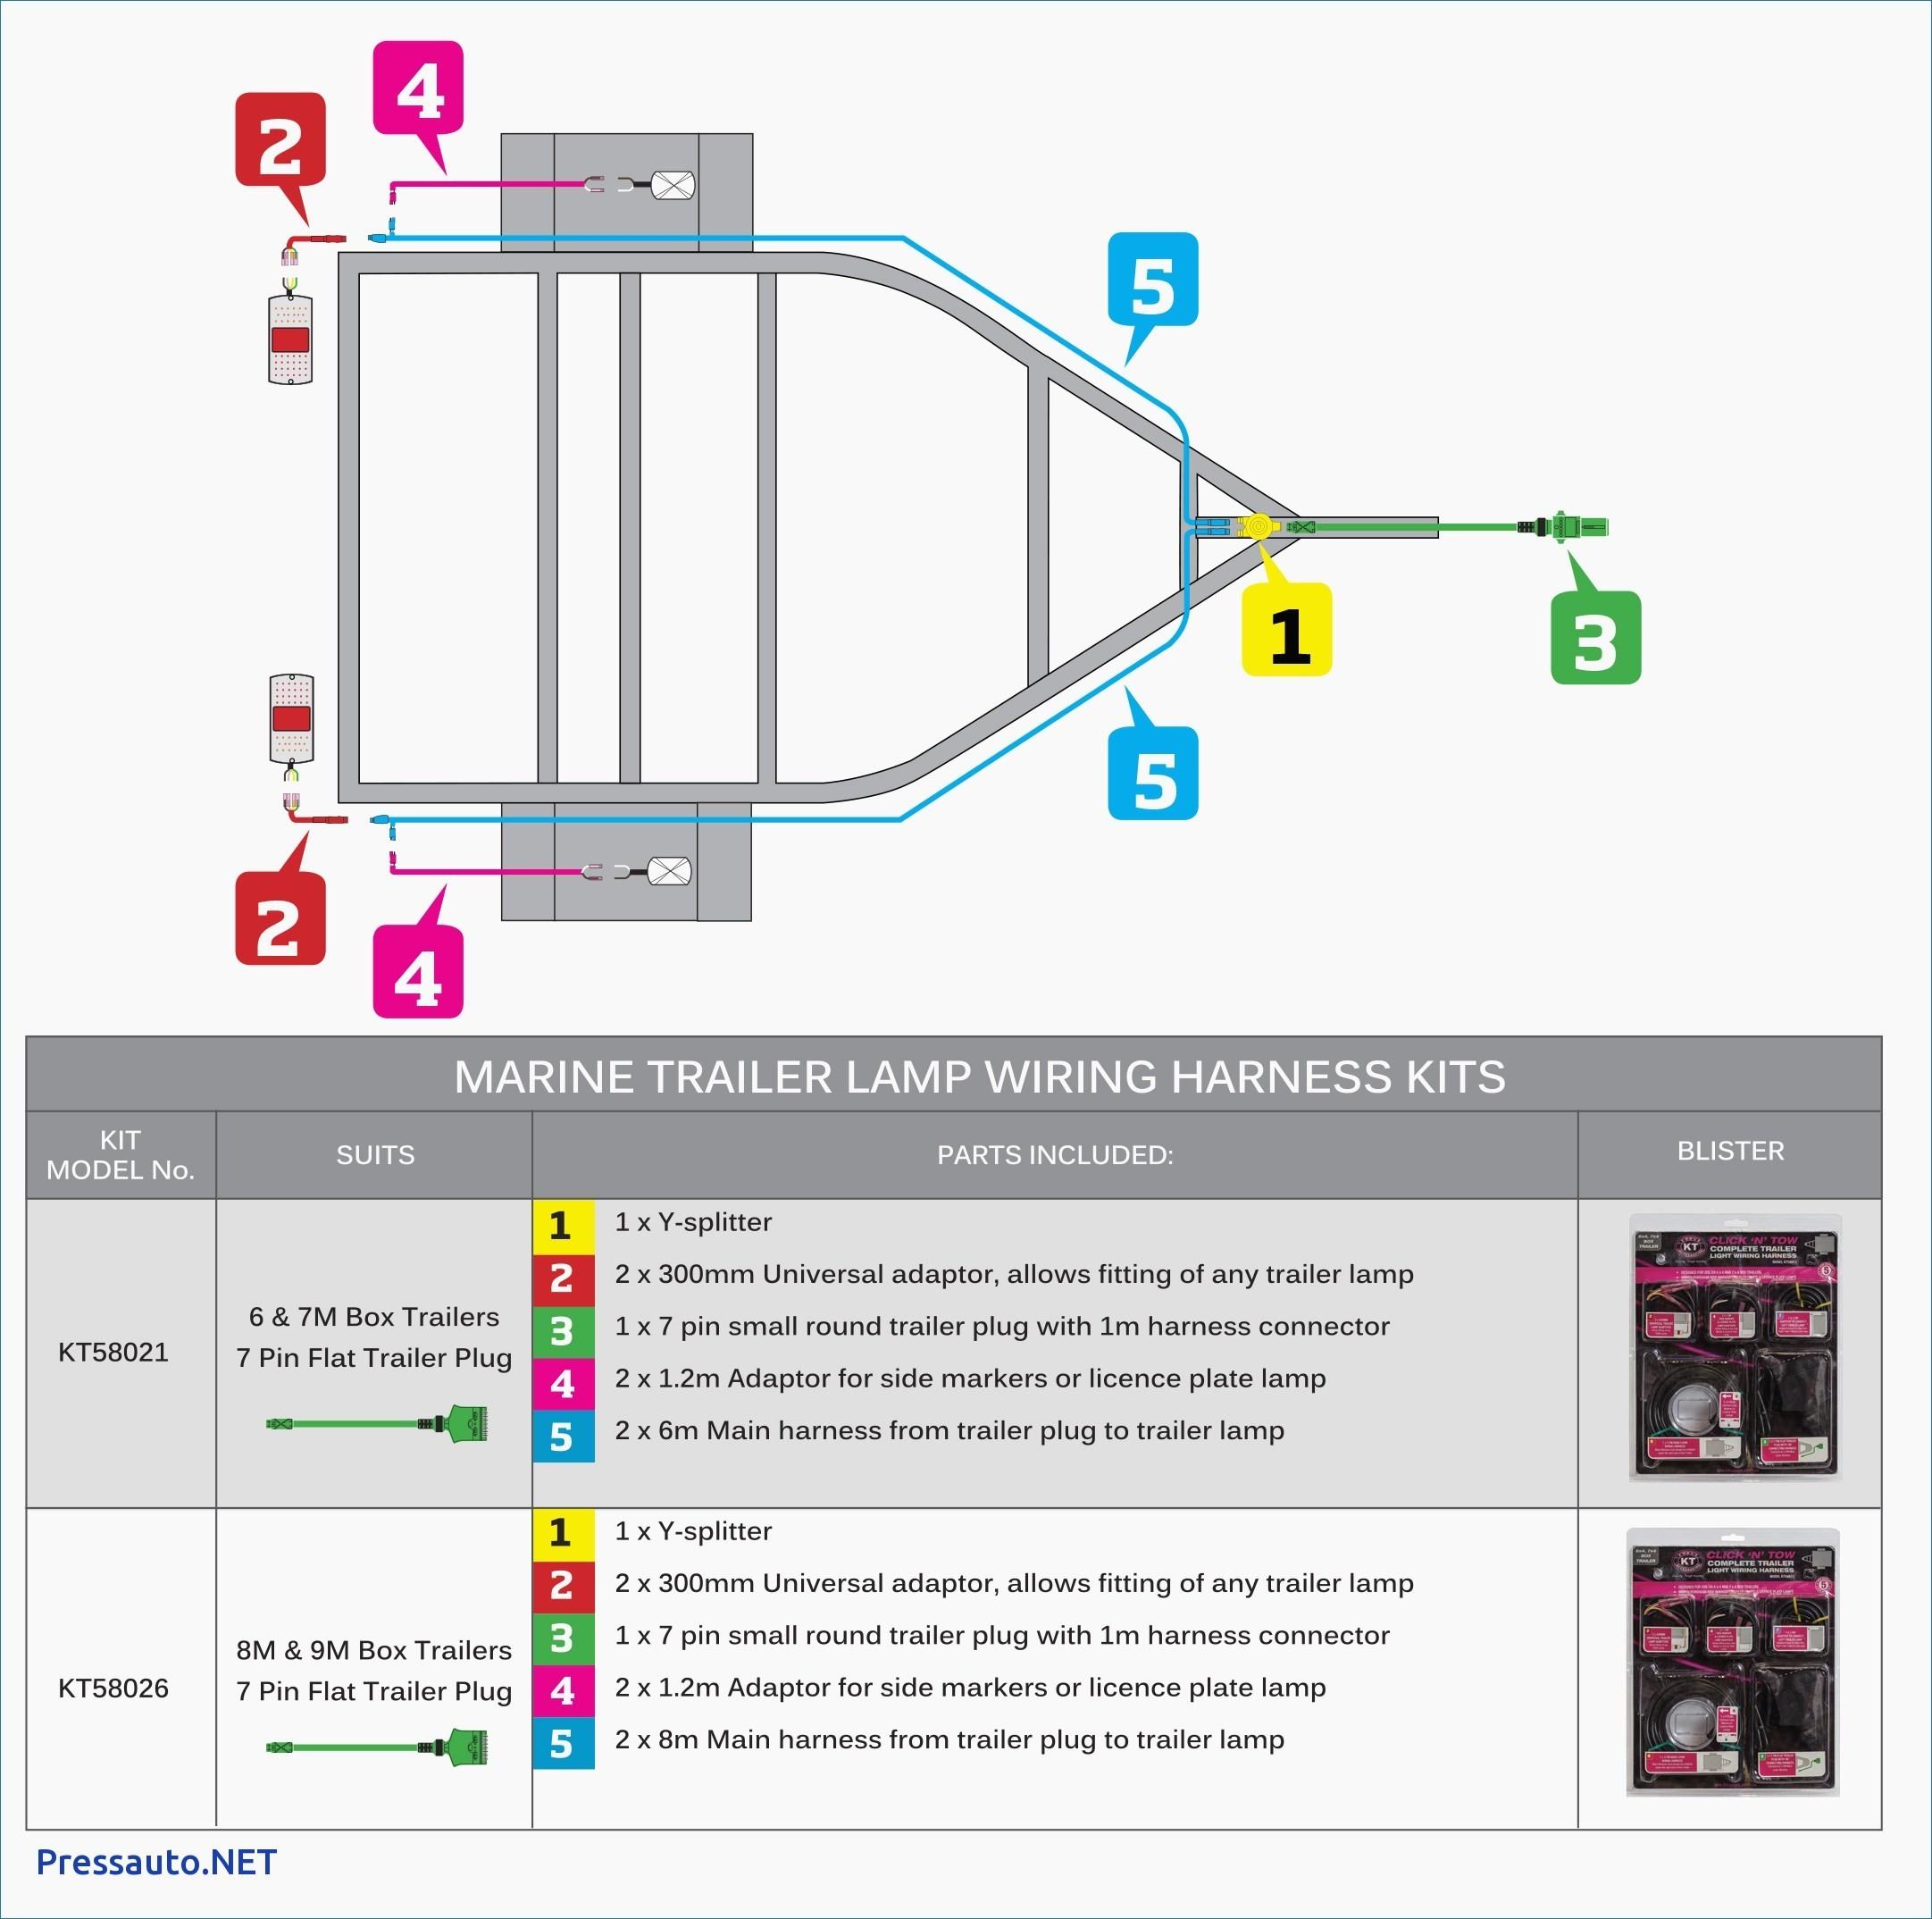 Car Trailer Wiring Diagram Wiring Diagram Trailer Marker Lights Valid 5 Pin Trailer Plug Wiring Of Car Trailer Wiring Diagram